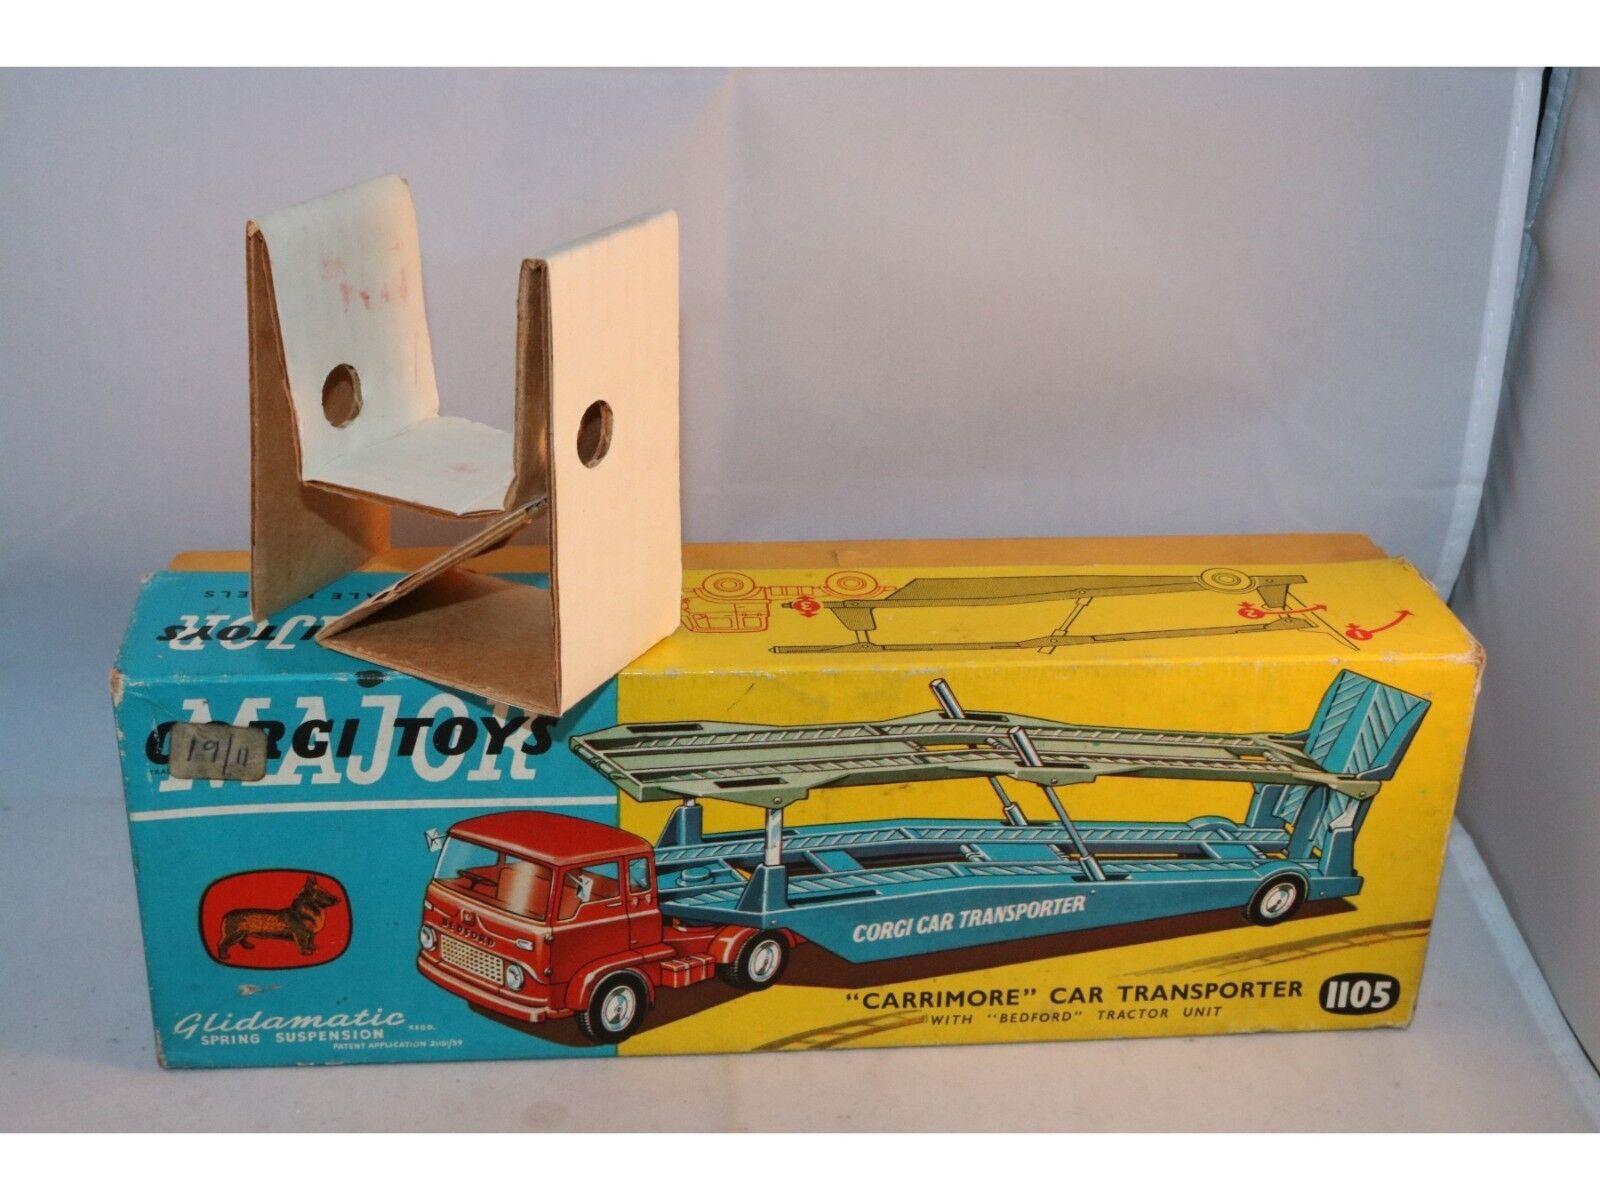 Corgi Toys 1105  Carrimore  Car Transporter Transporter Transporter complete empty original box 9c108d